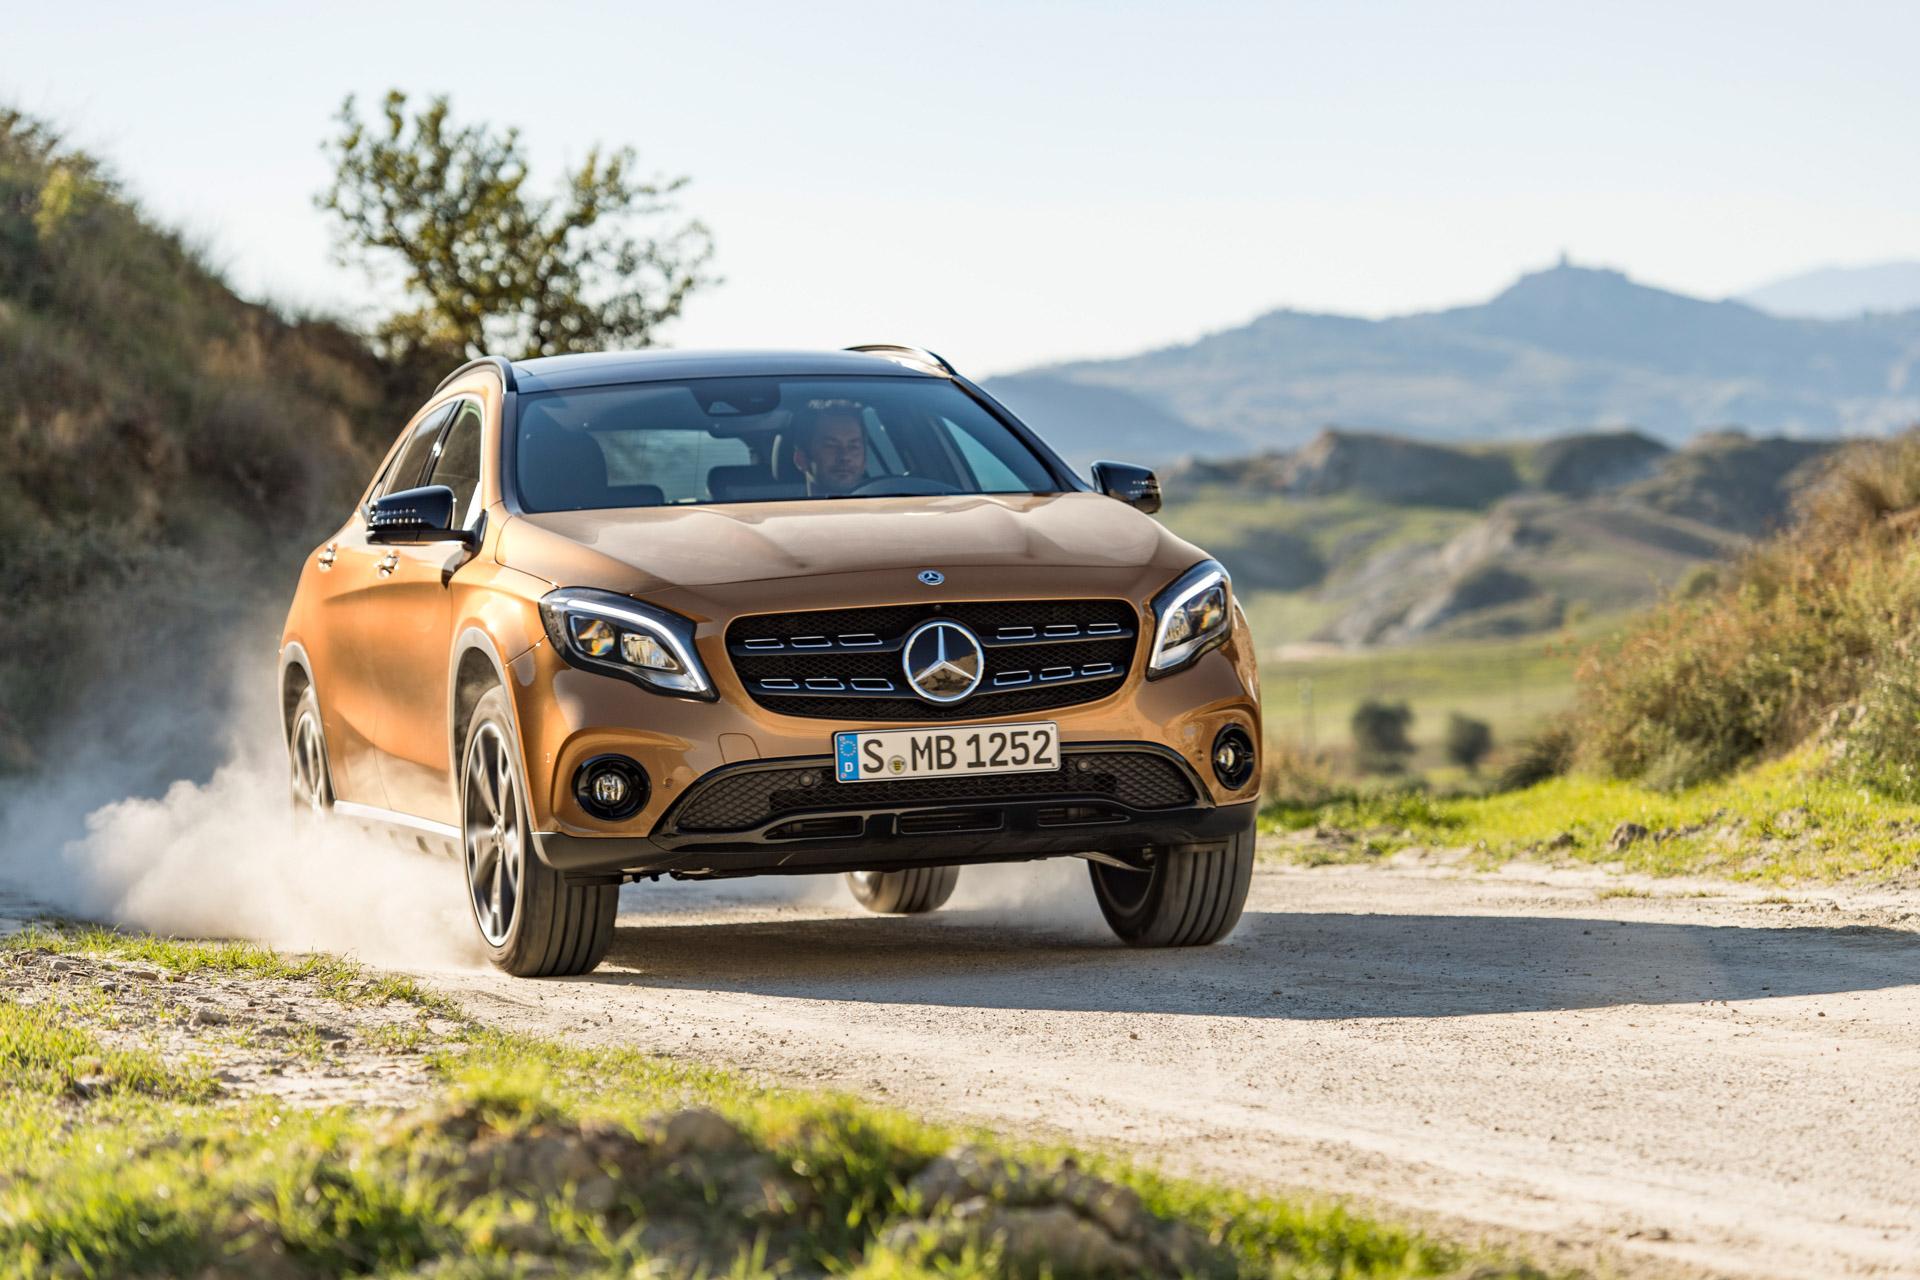 Mercedes-Benz GLA 220d 4MATIC, canyonbeige, Fahraufnahme ;Kraftstoffverbrauch kombiniert: 4,8 l/100 km, CO2-Emissionen kombiniert: 127 g/km Mercedes-Benz GLA 220d 4MATIC, canyon beige, driving shot; Fuel consumption combined:  4.8 l/100 km; Combined CO2 emissions: 127 g/km